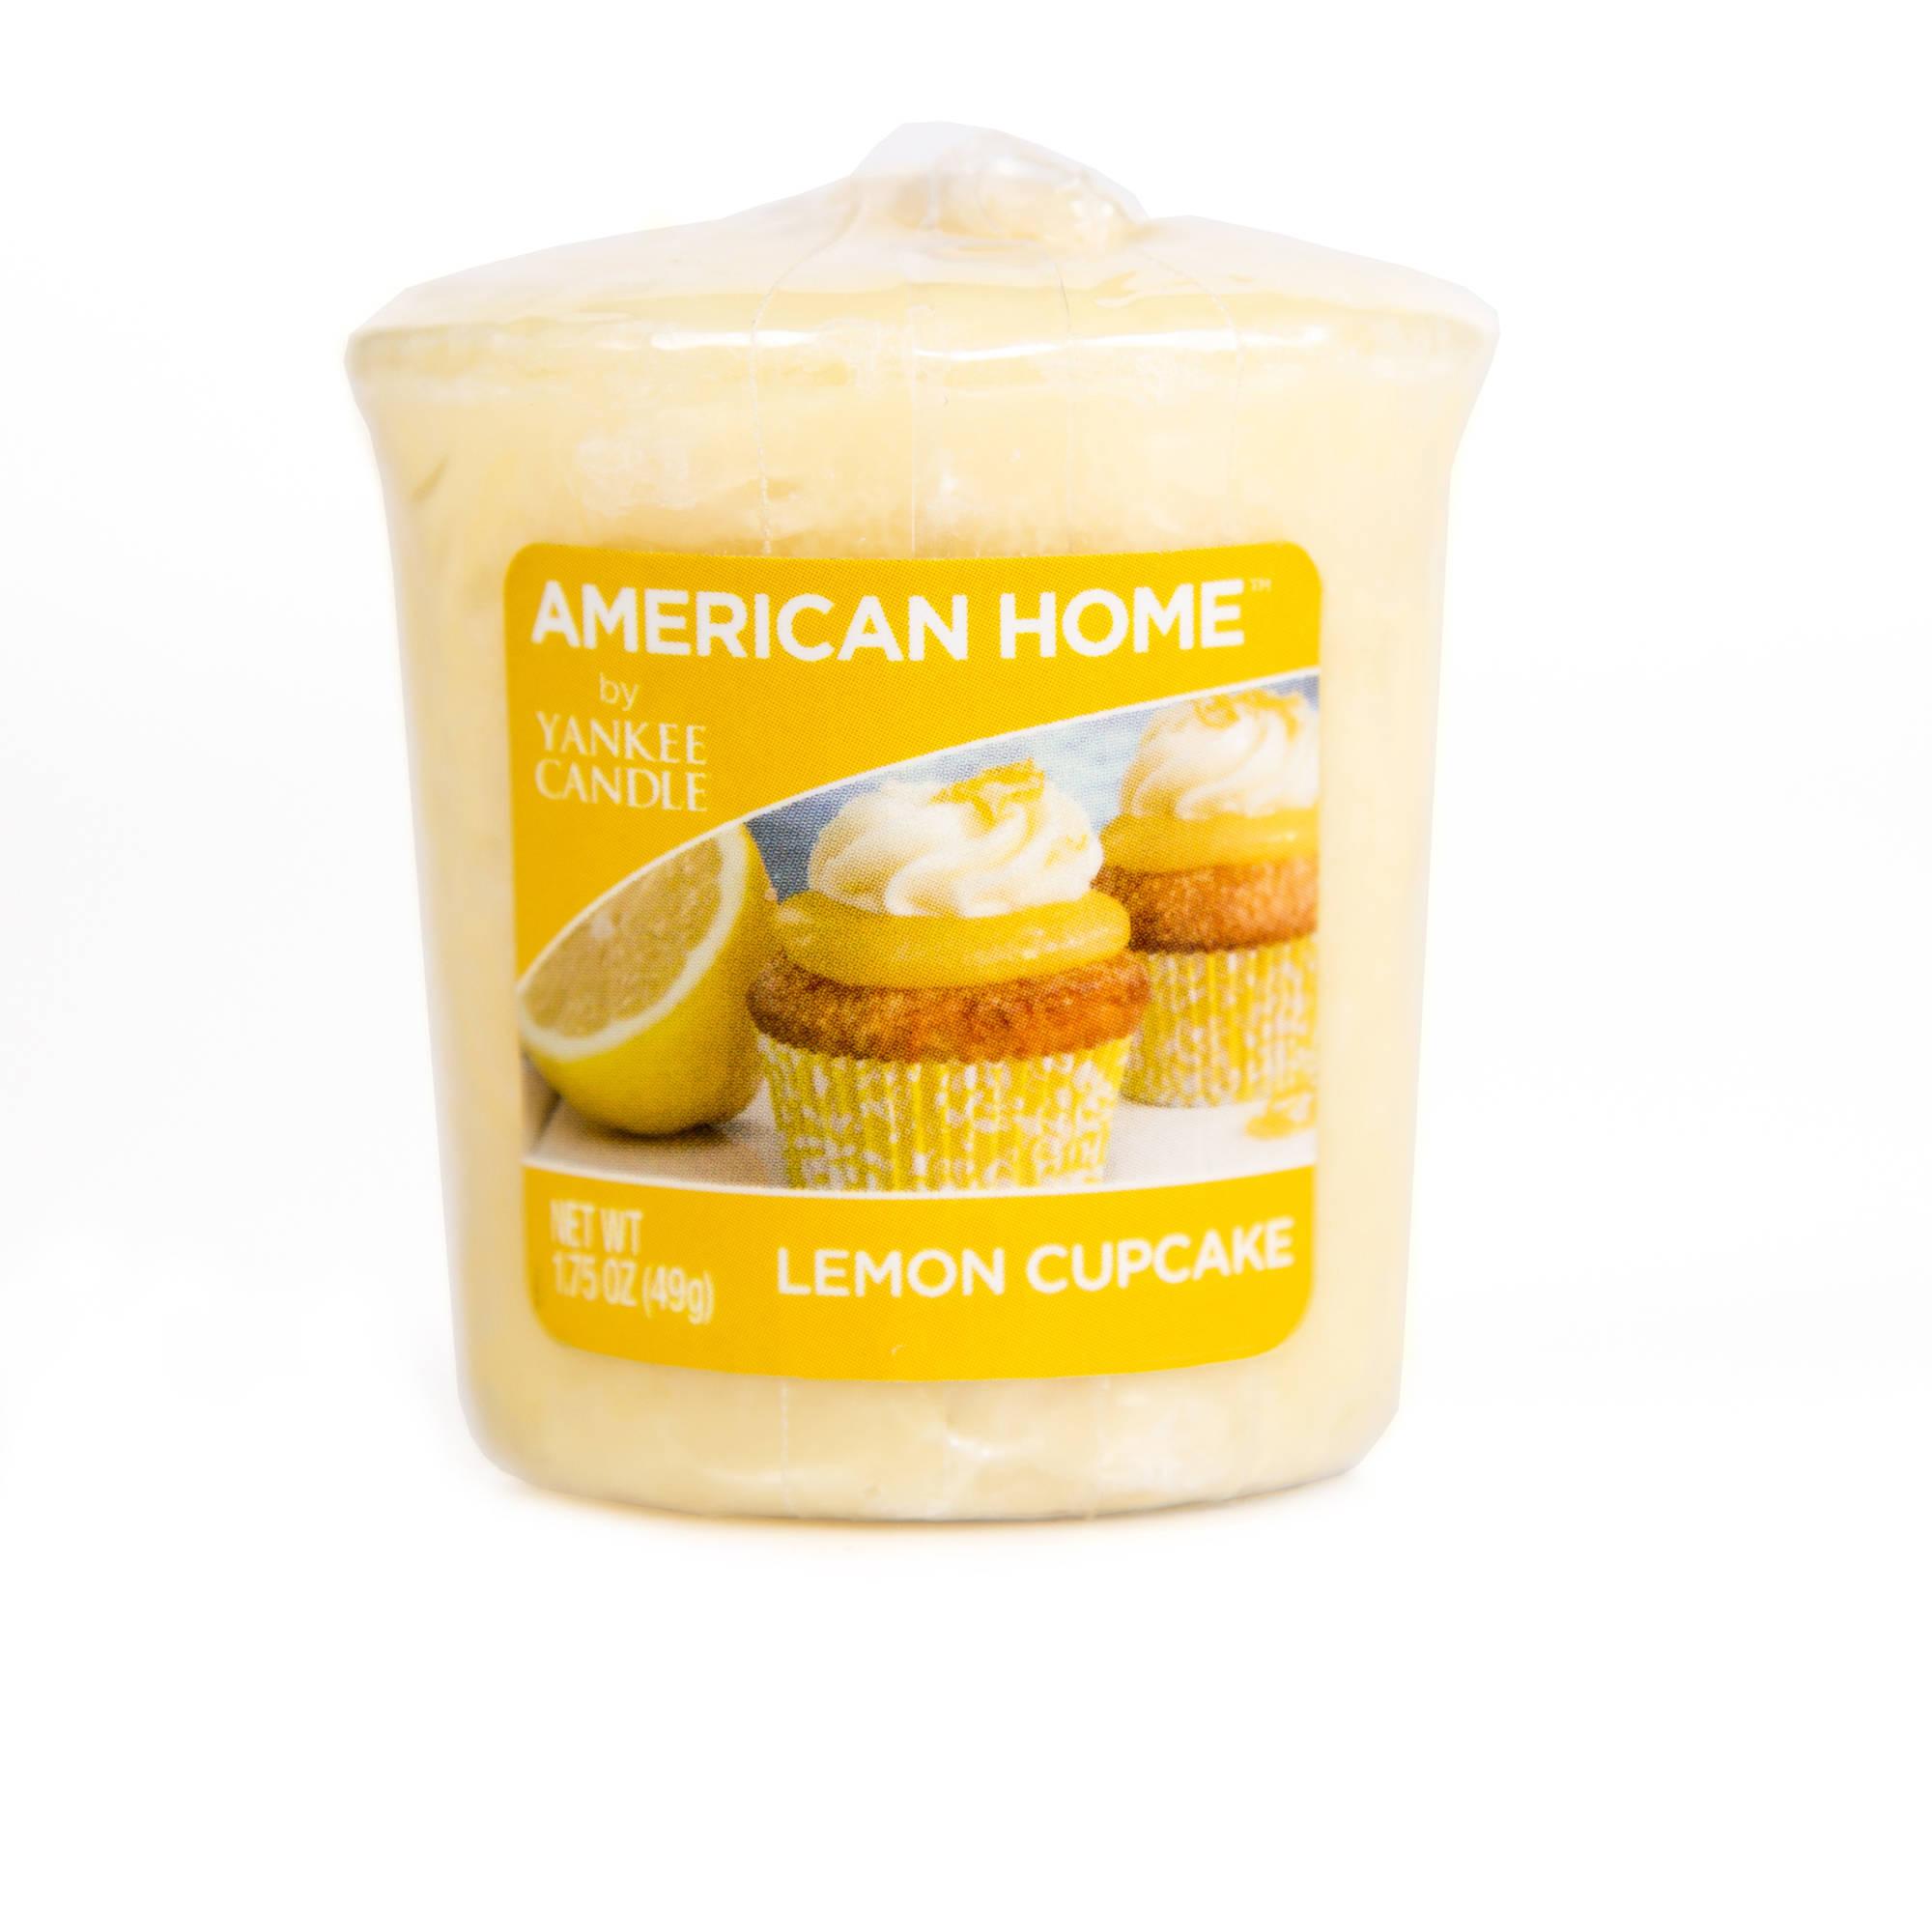 American Home by Yankee Candle Lemon Cupcake, Votive